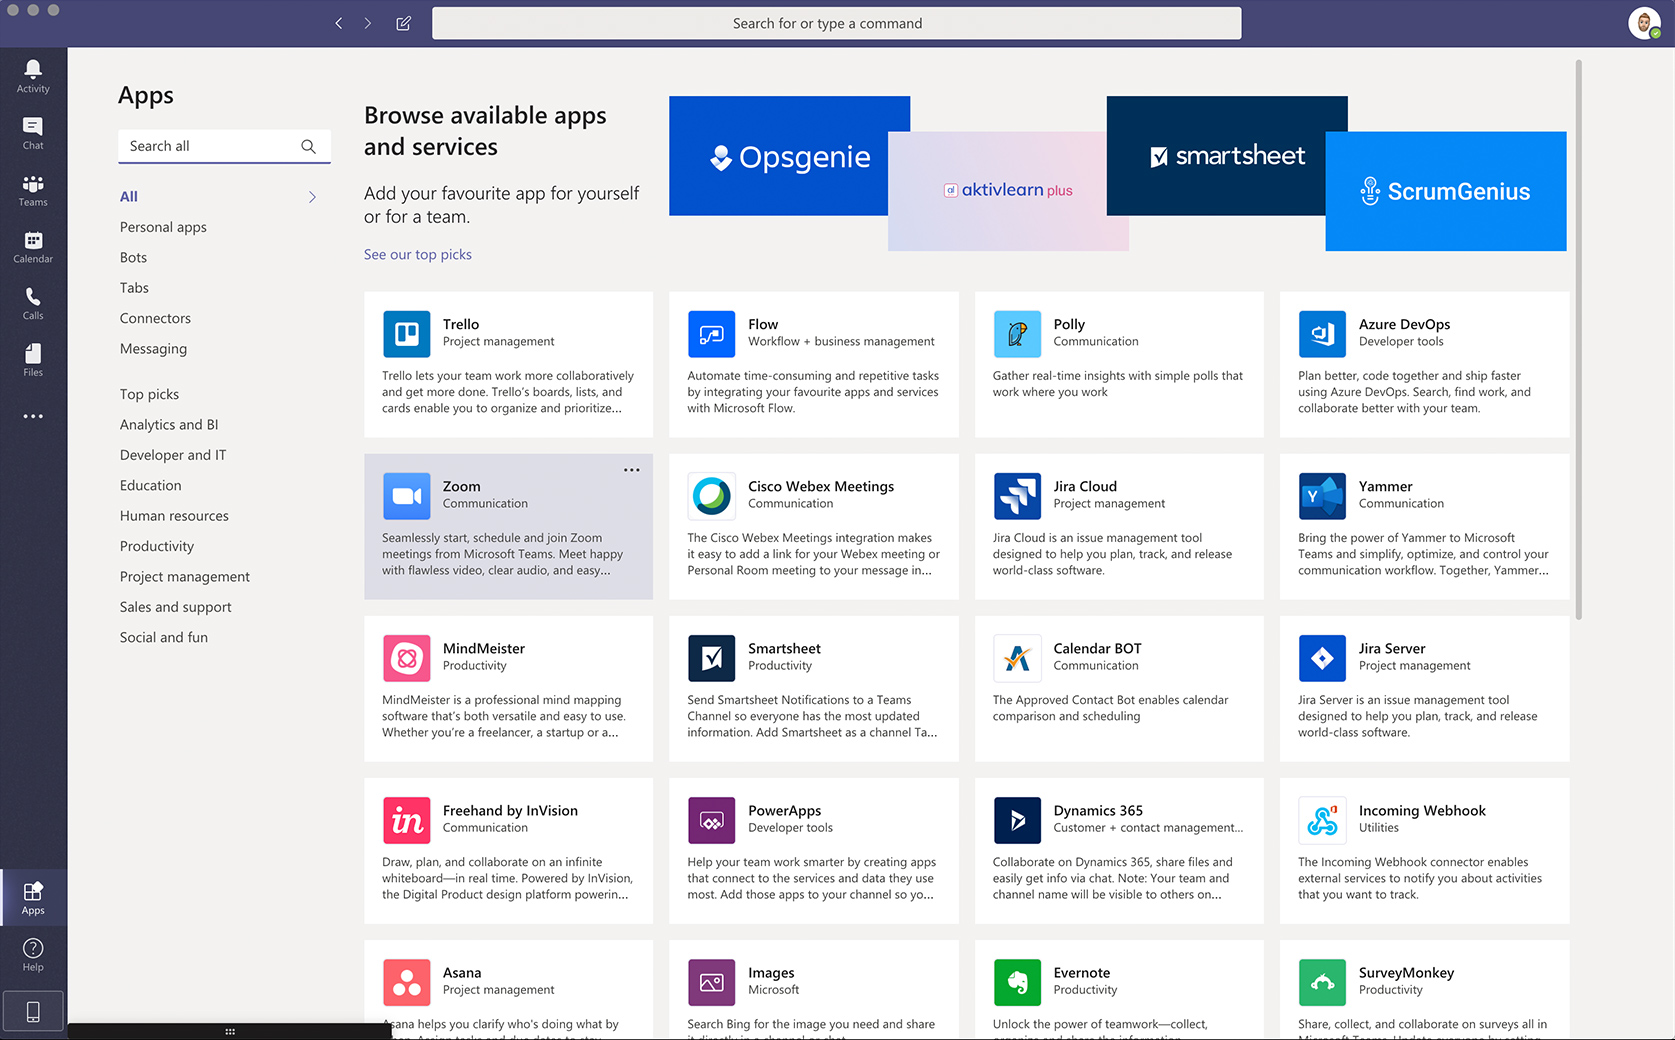 Apps in Microsoft Teams